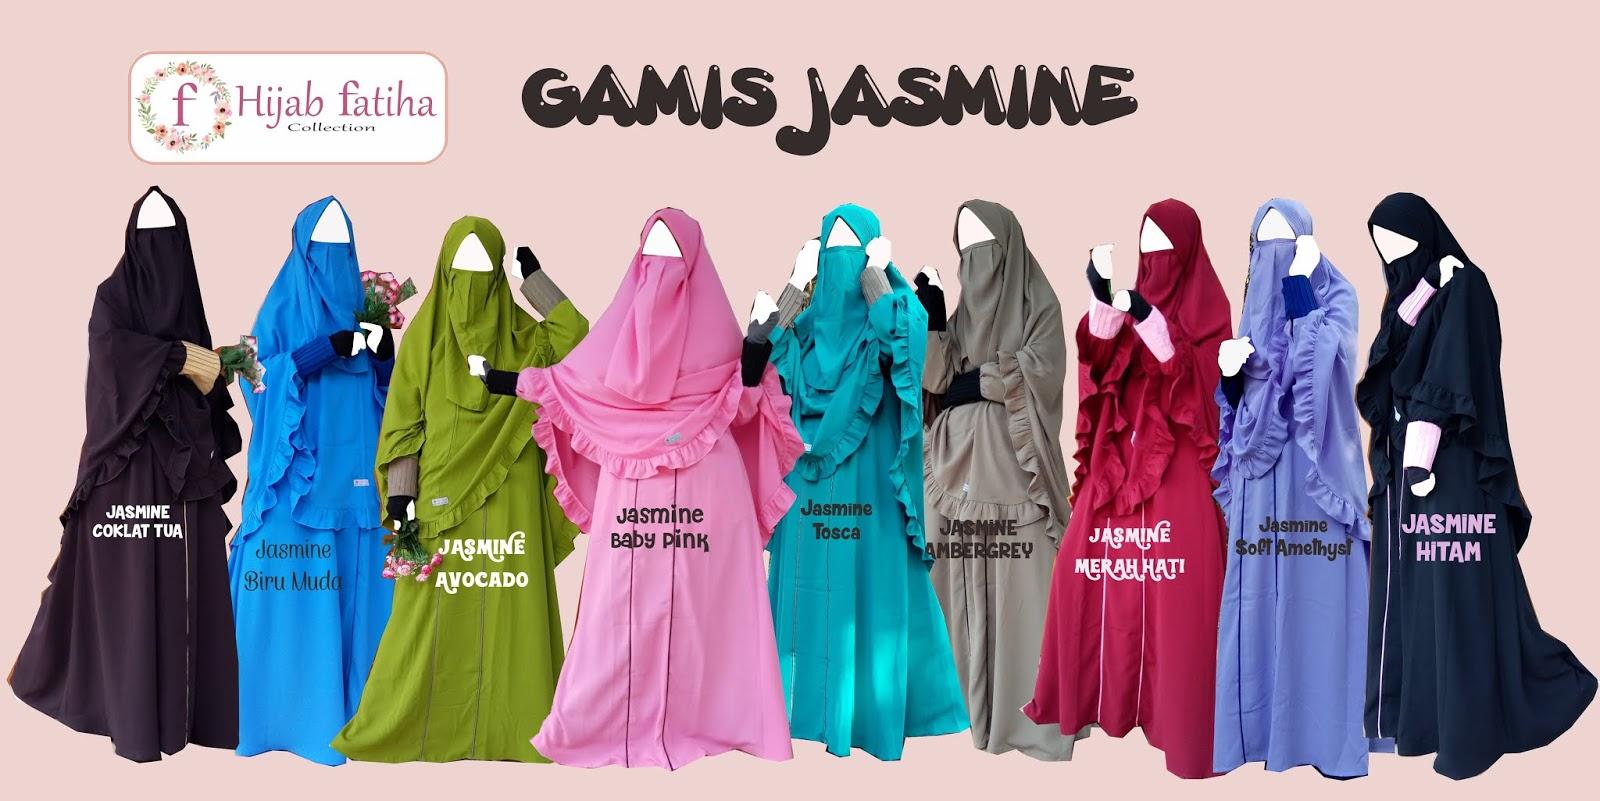 Gamis Jasmine Hijab Syar I Terbaru Gamis Syar I Terbaru 2019